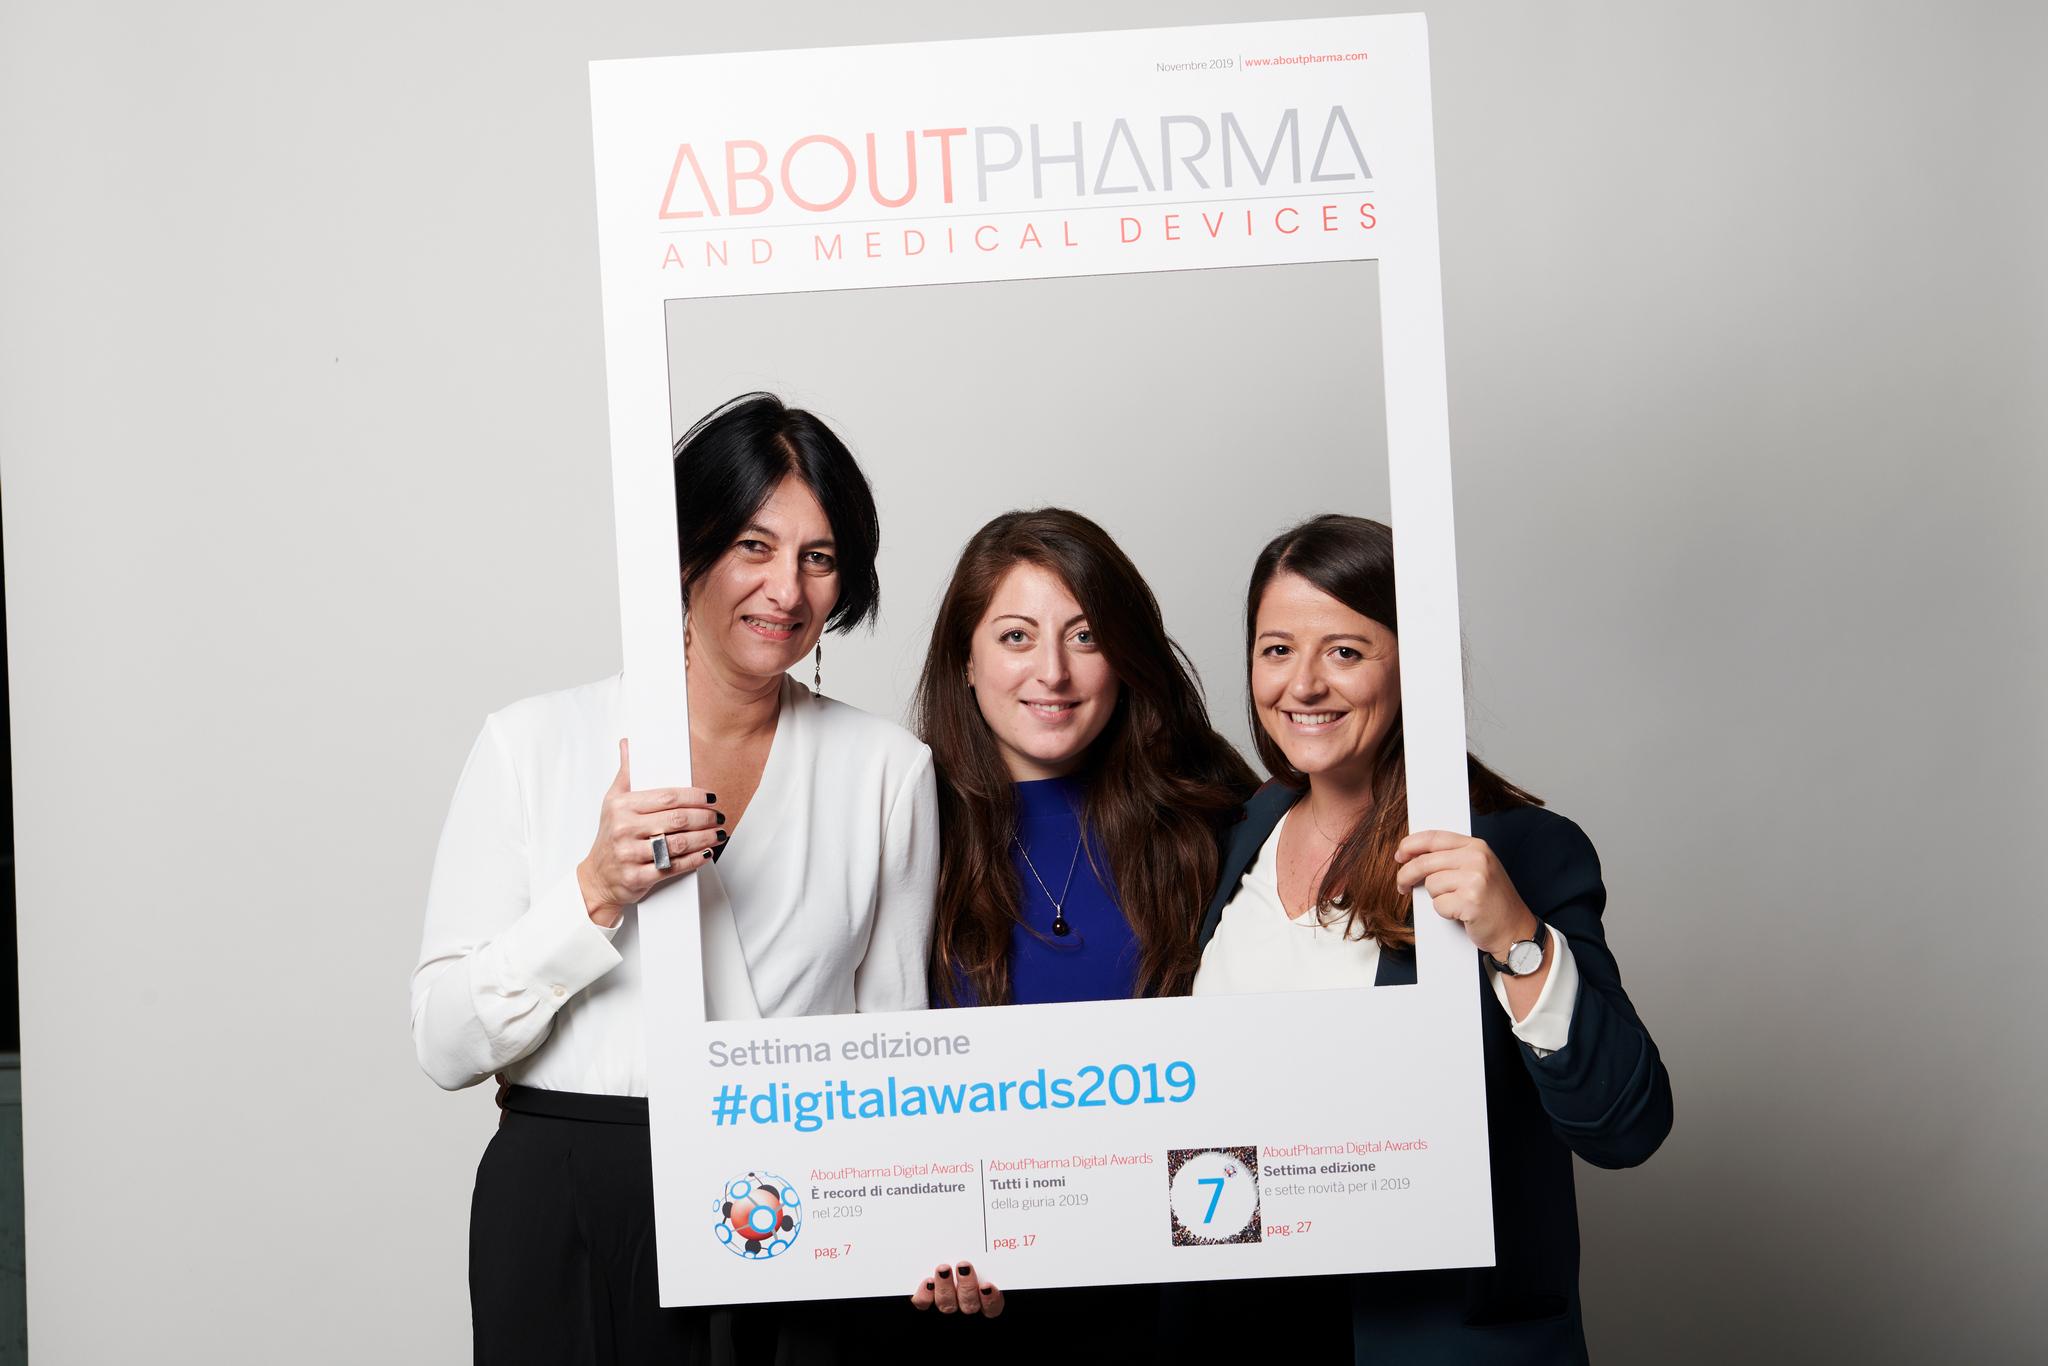 Photobooth AboutPharma Digital Awards 2019_71